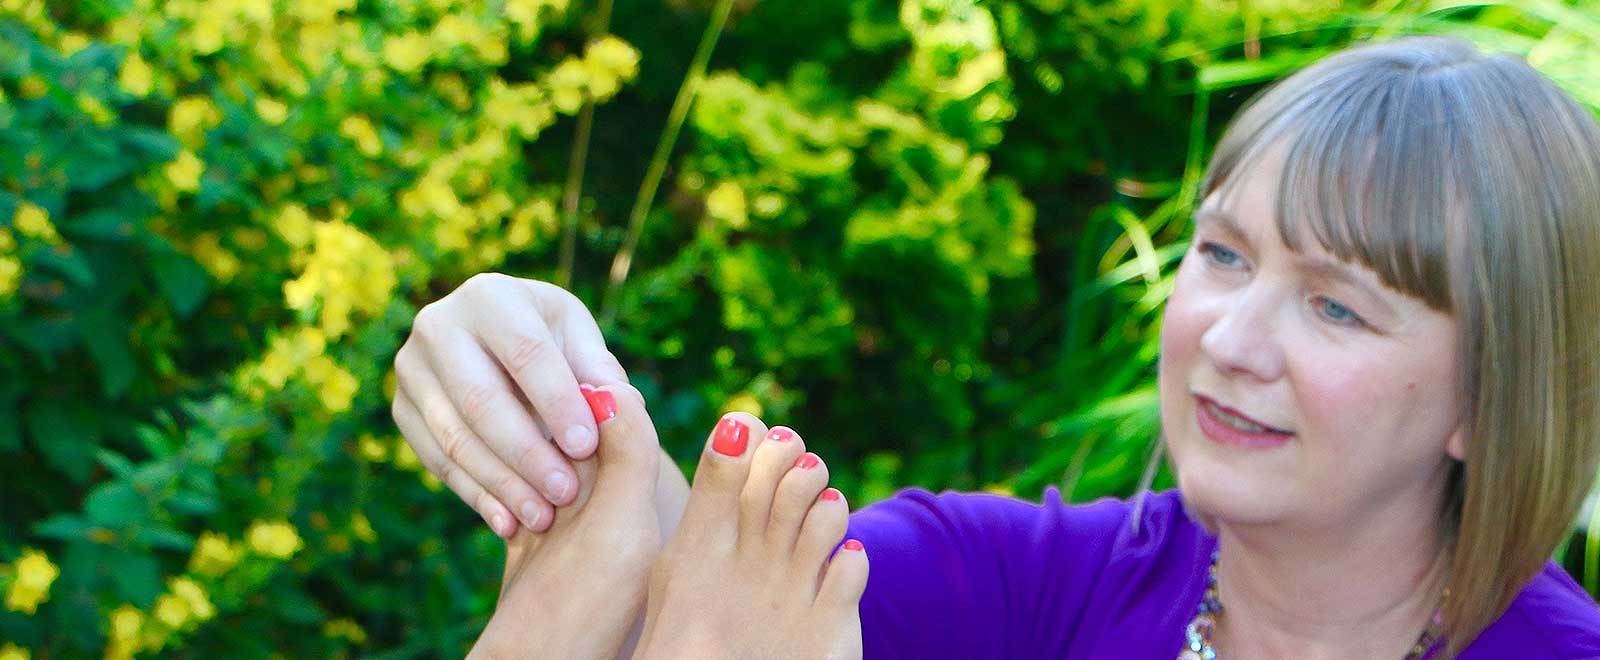 Lisons nos pieds par Jane Sheehan